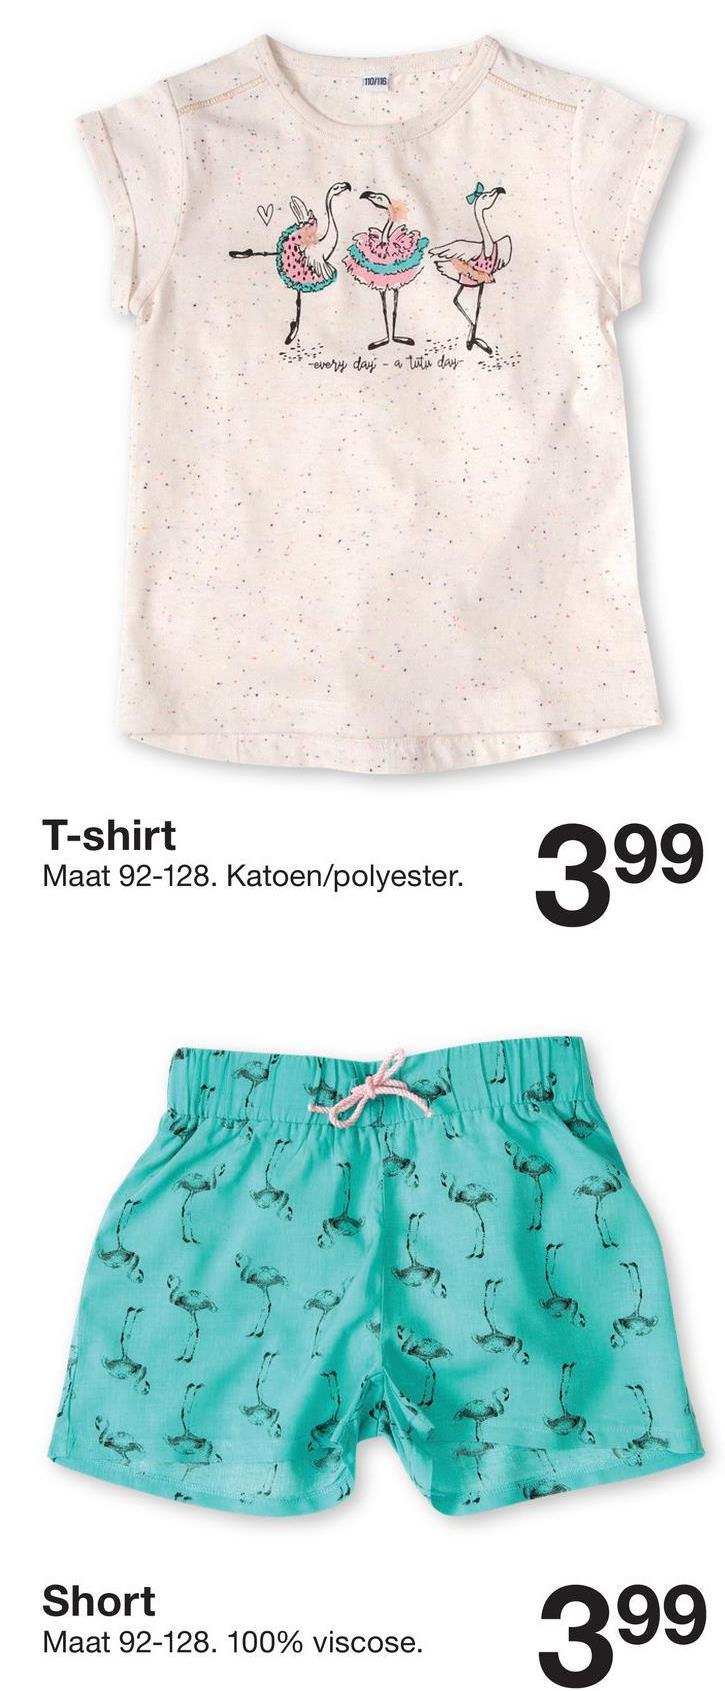 every day - a tuti day T-shirt Maat 92-128. Katoen/polyester. sturta kalan bebas 399 Short Maat 92-128. 100% viscose.